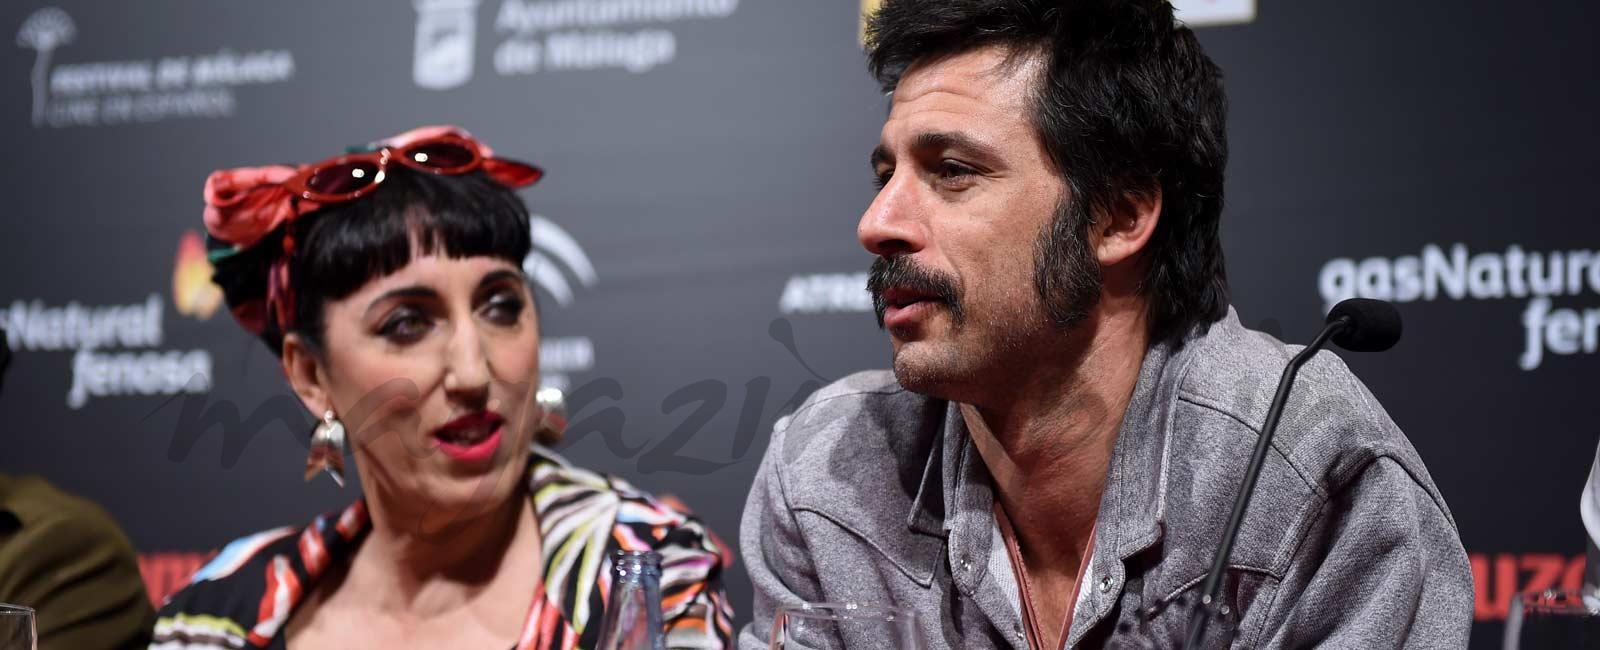 Hugo Silva y Rossy de Palma, la extraña pareja